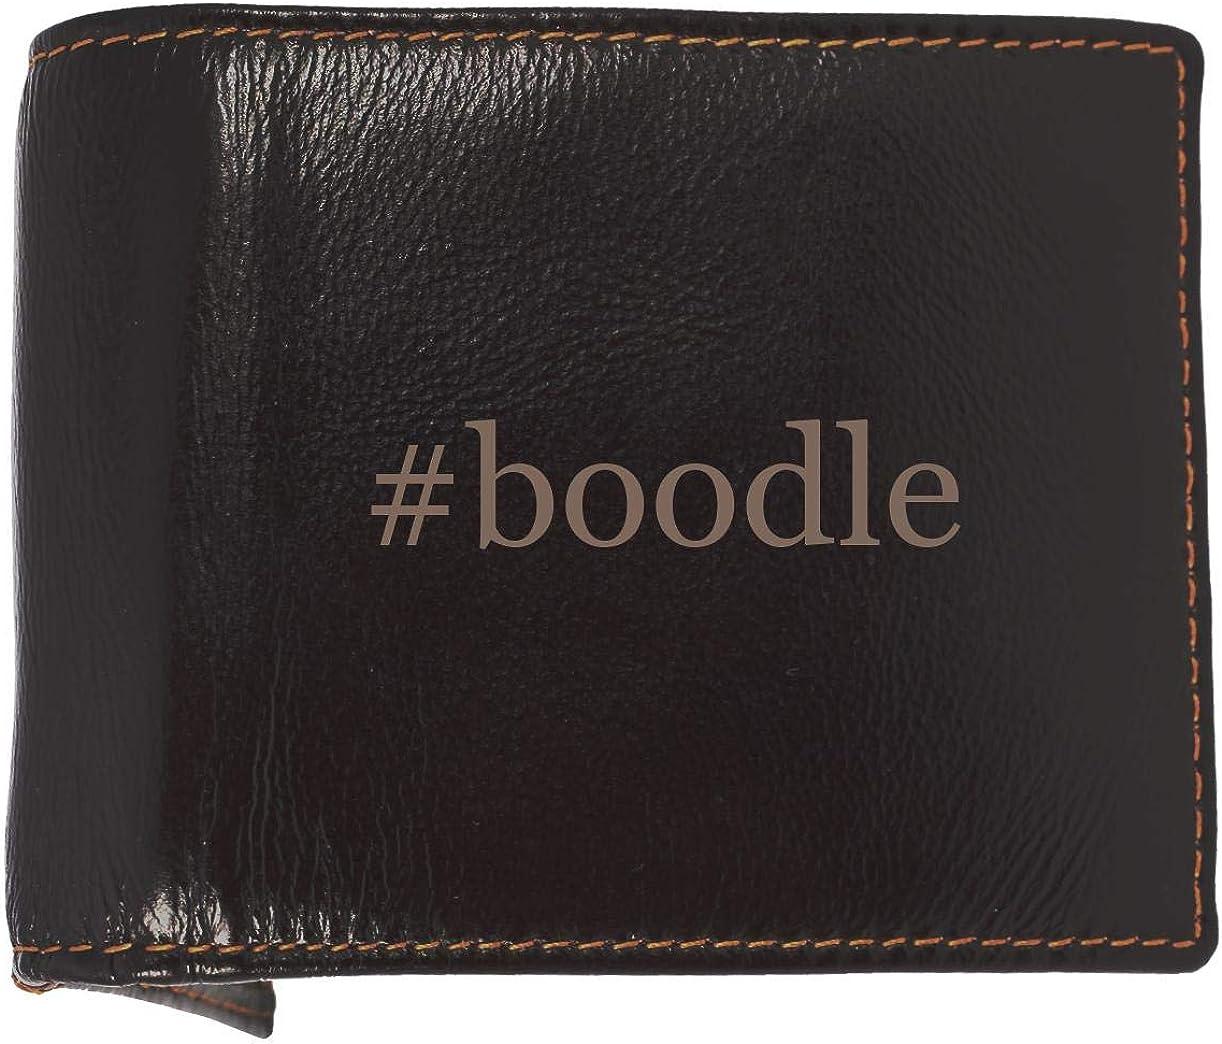 #boodle - Soft Hashtag Cowhide Genuine Engraved Bifold Leather Wallet 61VgDxJJbhL